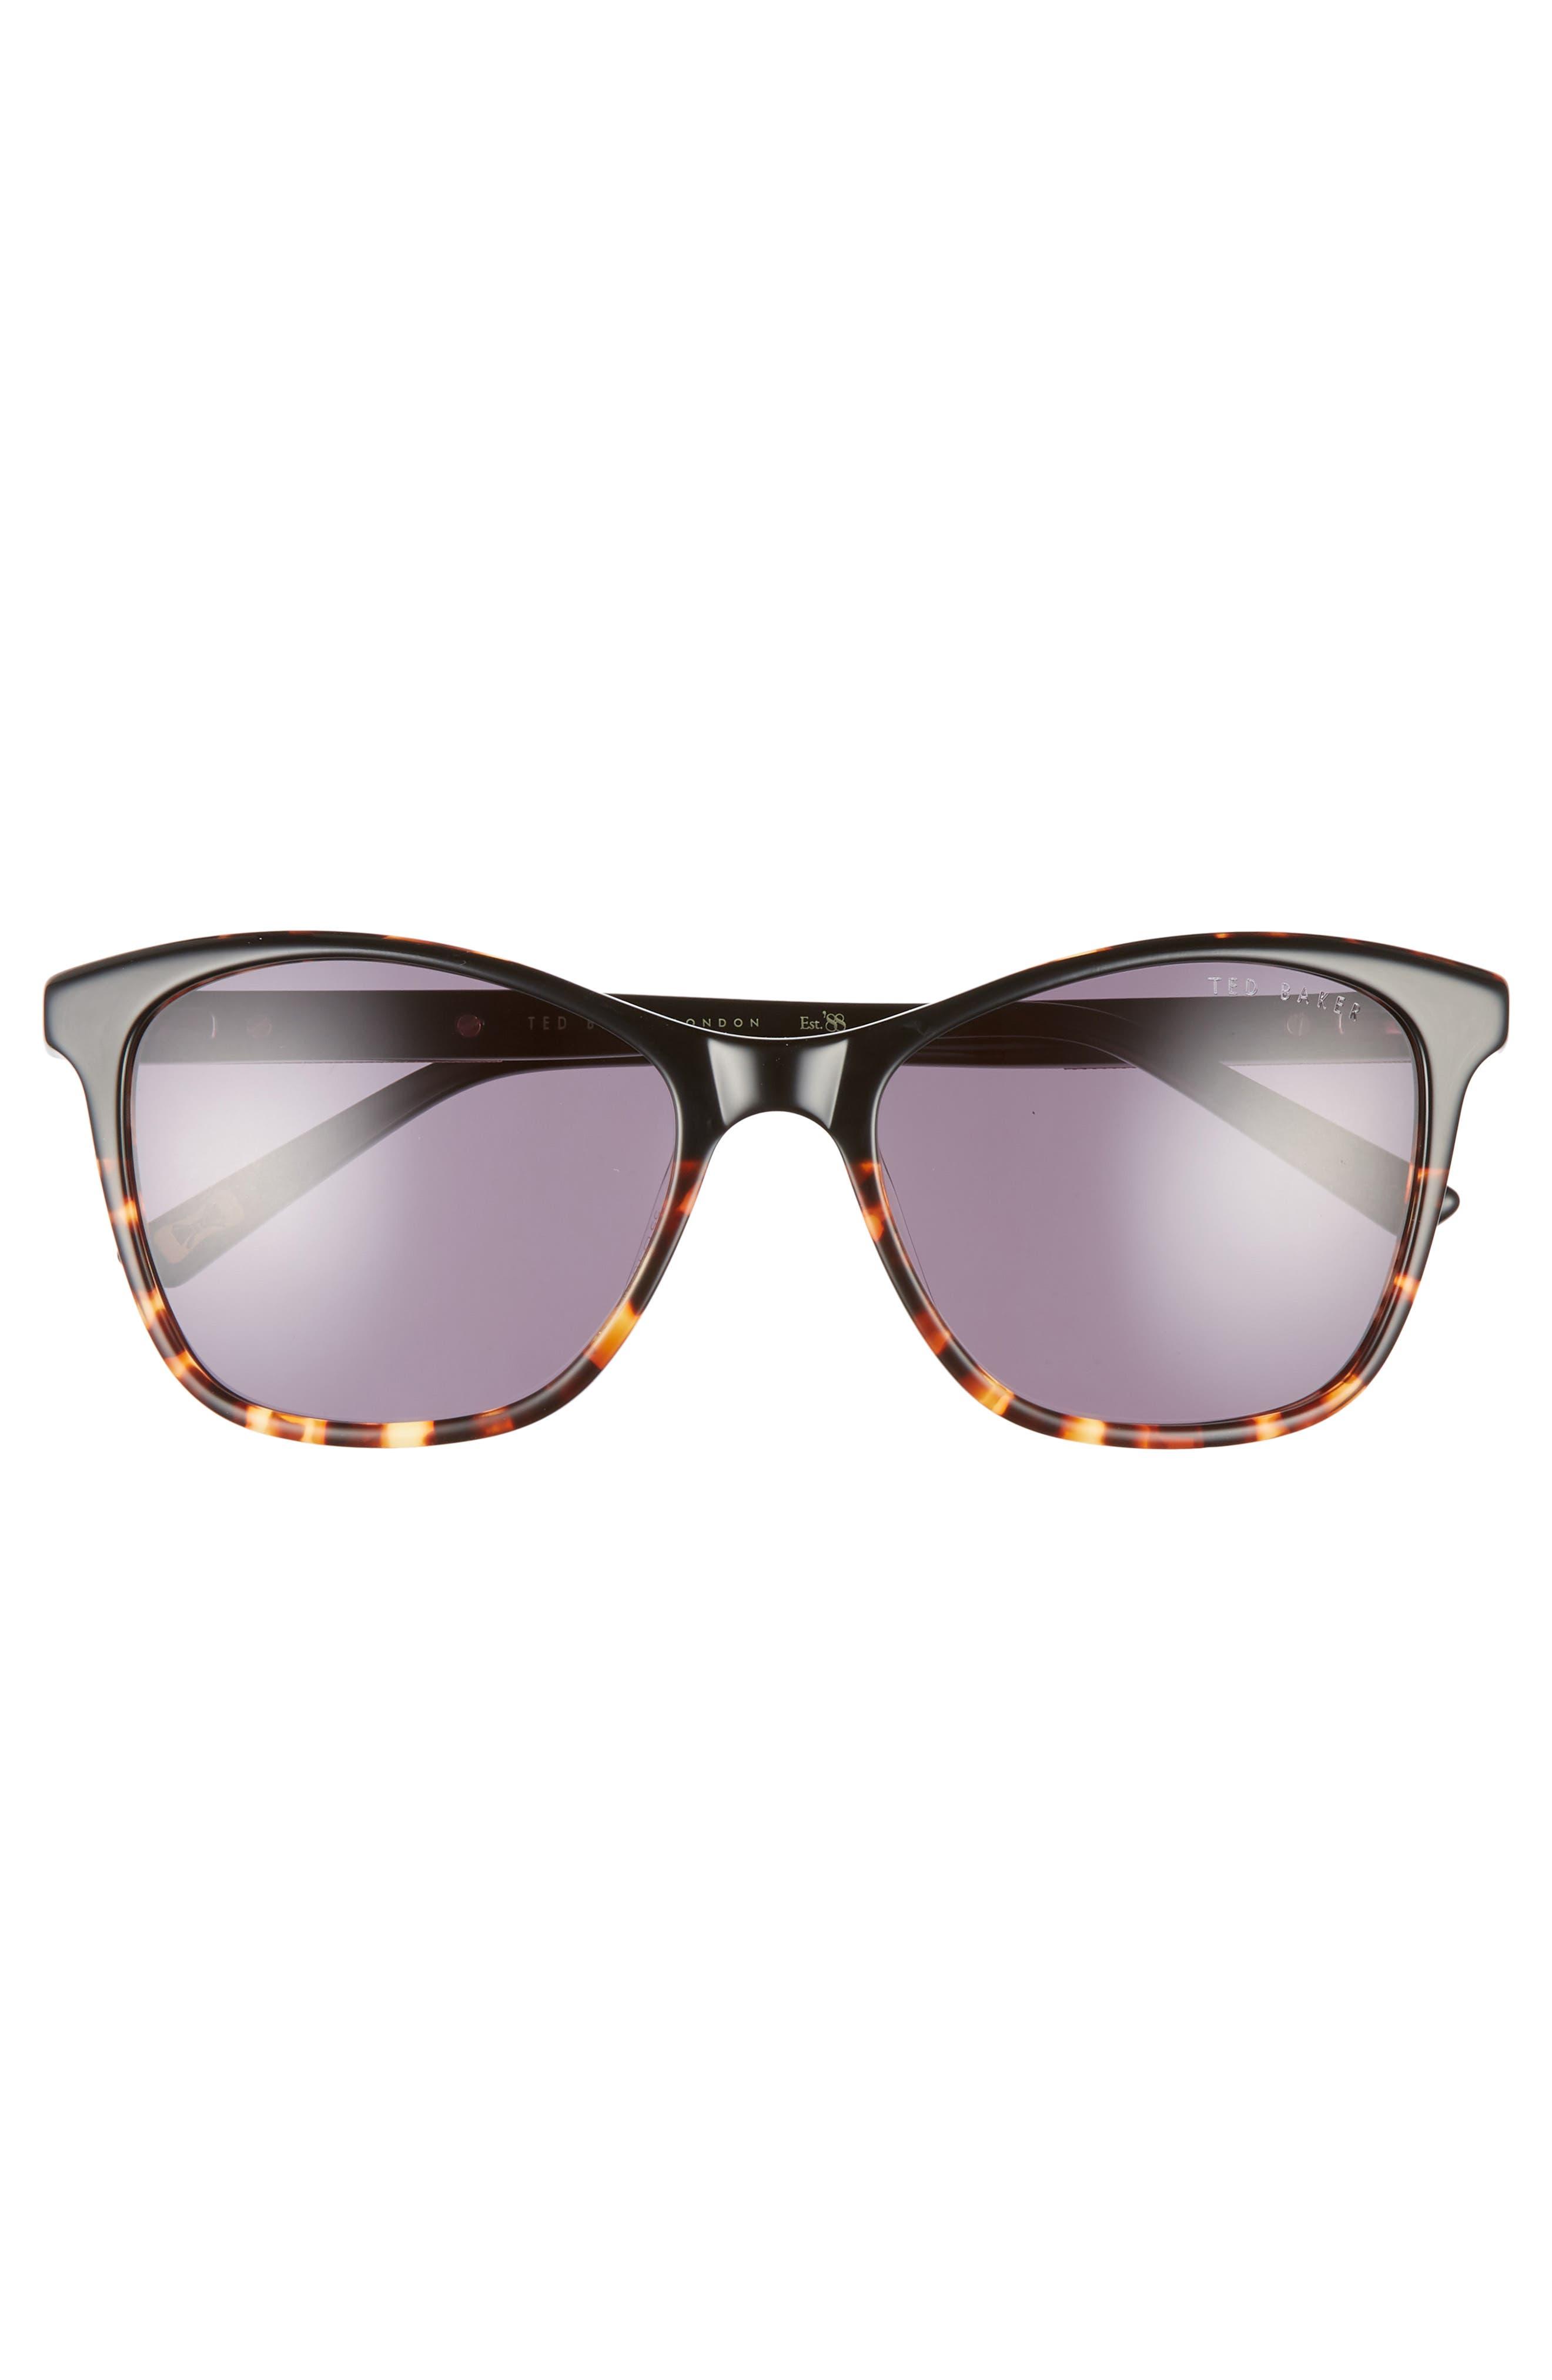 TED BAKER LONDON, 55mm Square Cat Eye Sunglasses, Alternate thumbnail 3, color, BLACK HAVANA/ GOLD/ PURPLE